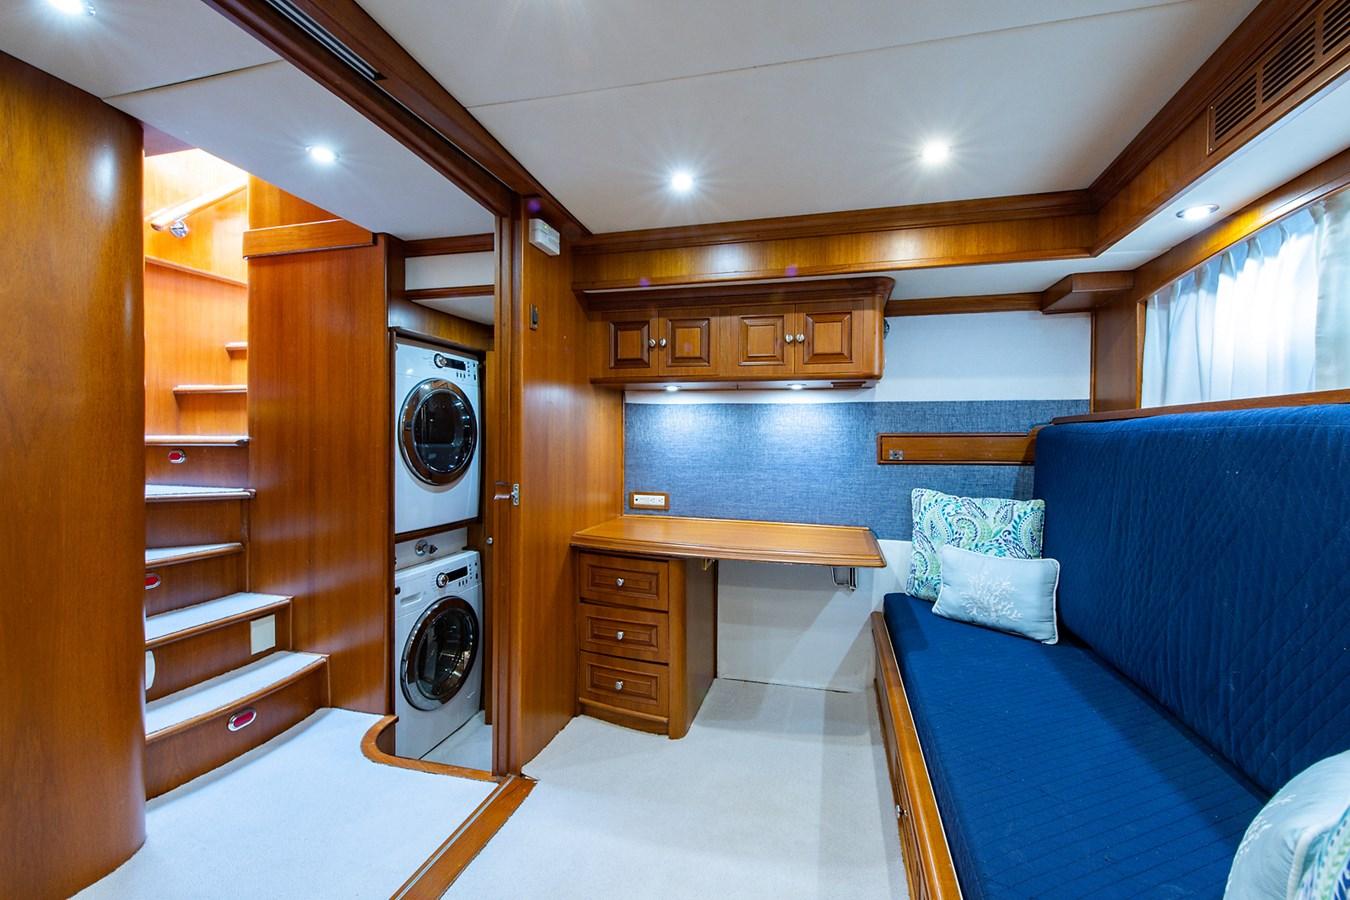 Tout Va Bien_Guest Stateroom-Den8 2005 GRAND BANKS 64 Aleutian RP Motor Yacht 2726175